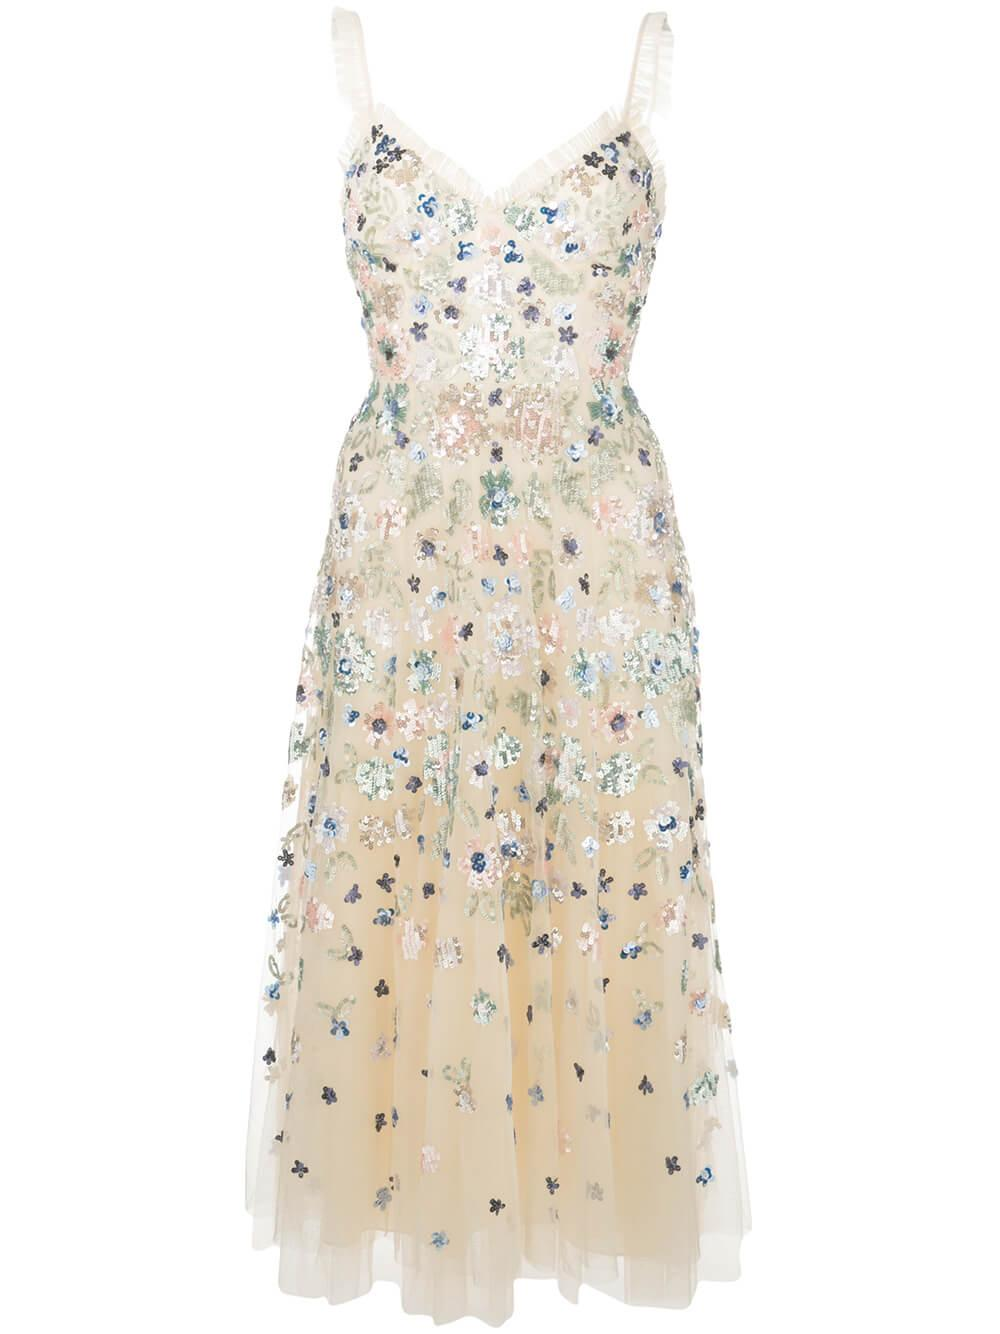 Wildflower Sequin Mini Dress Item # DR0030PS20-CPN